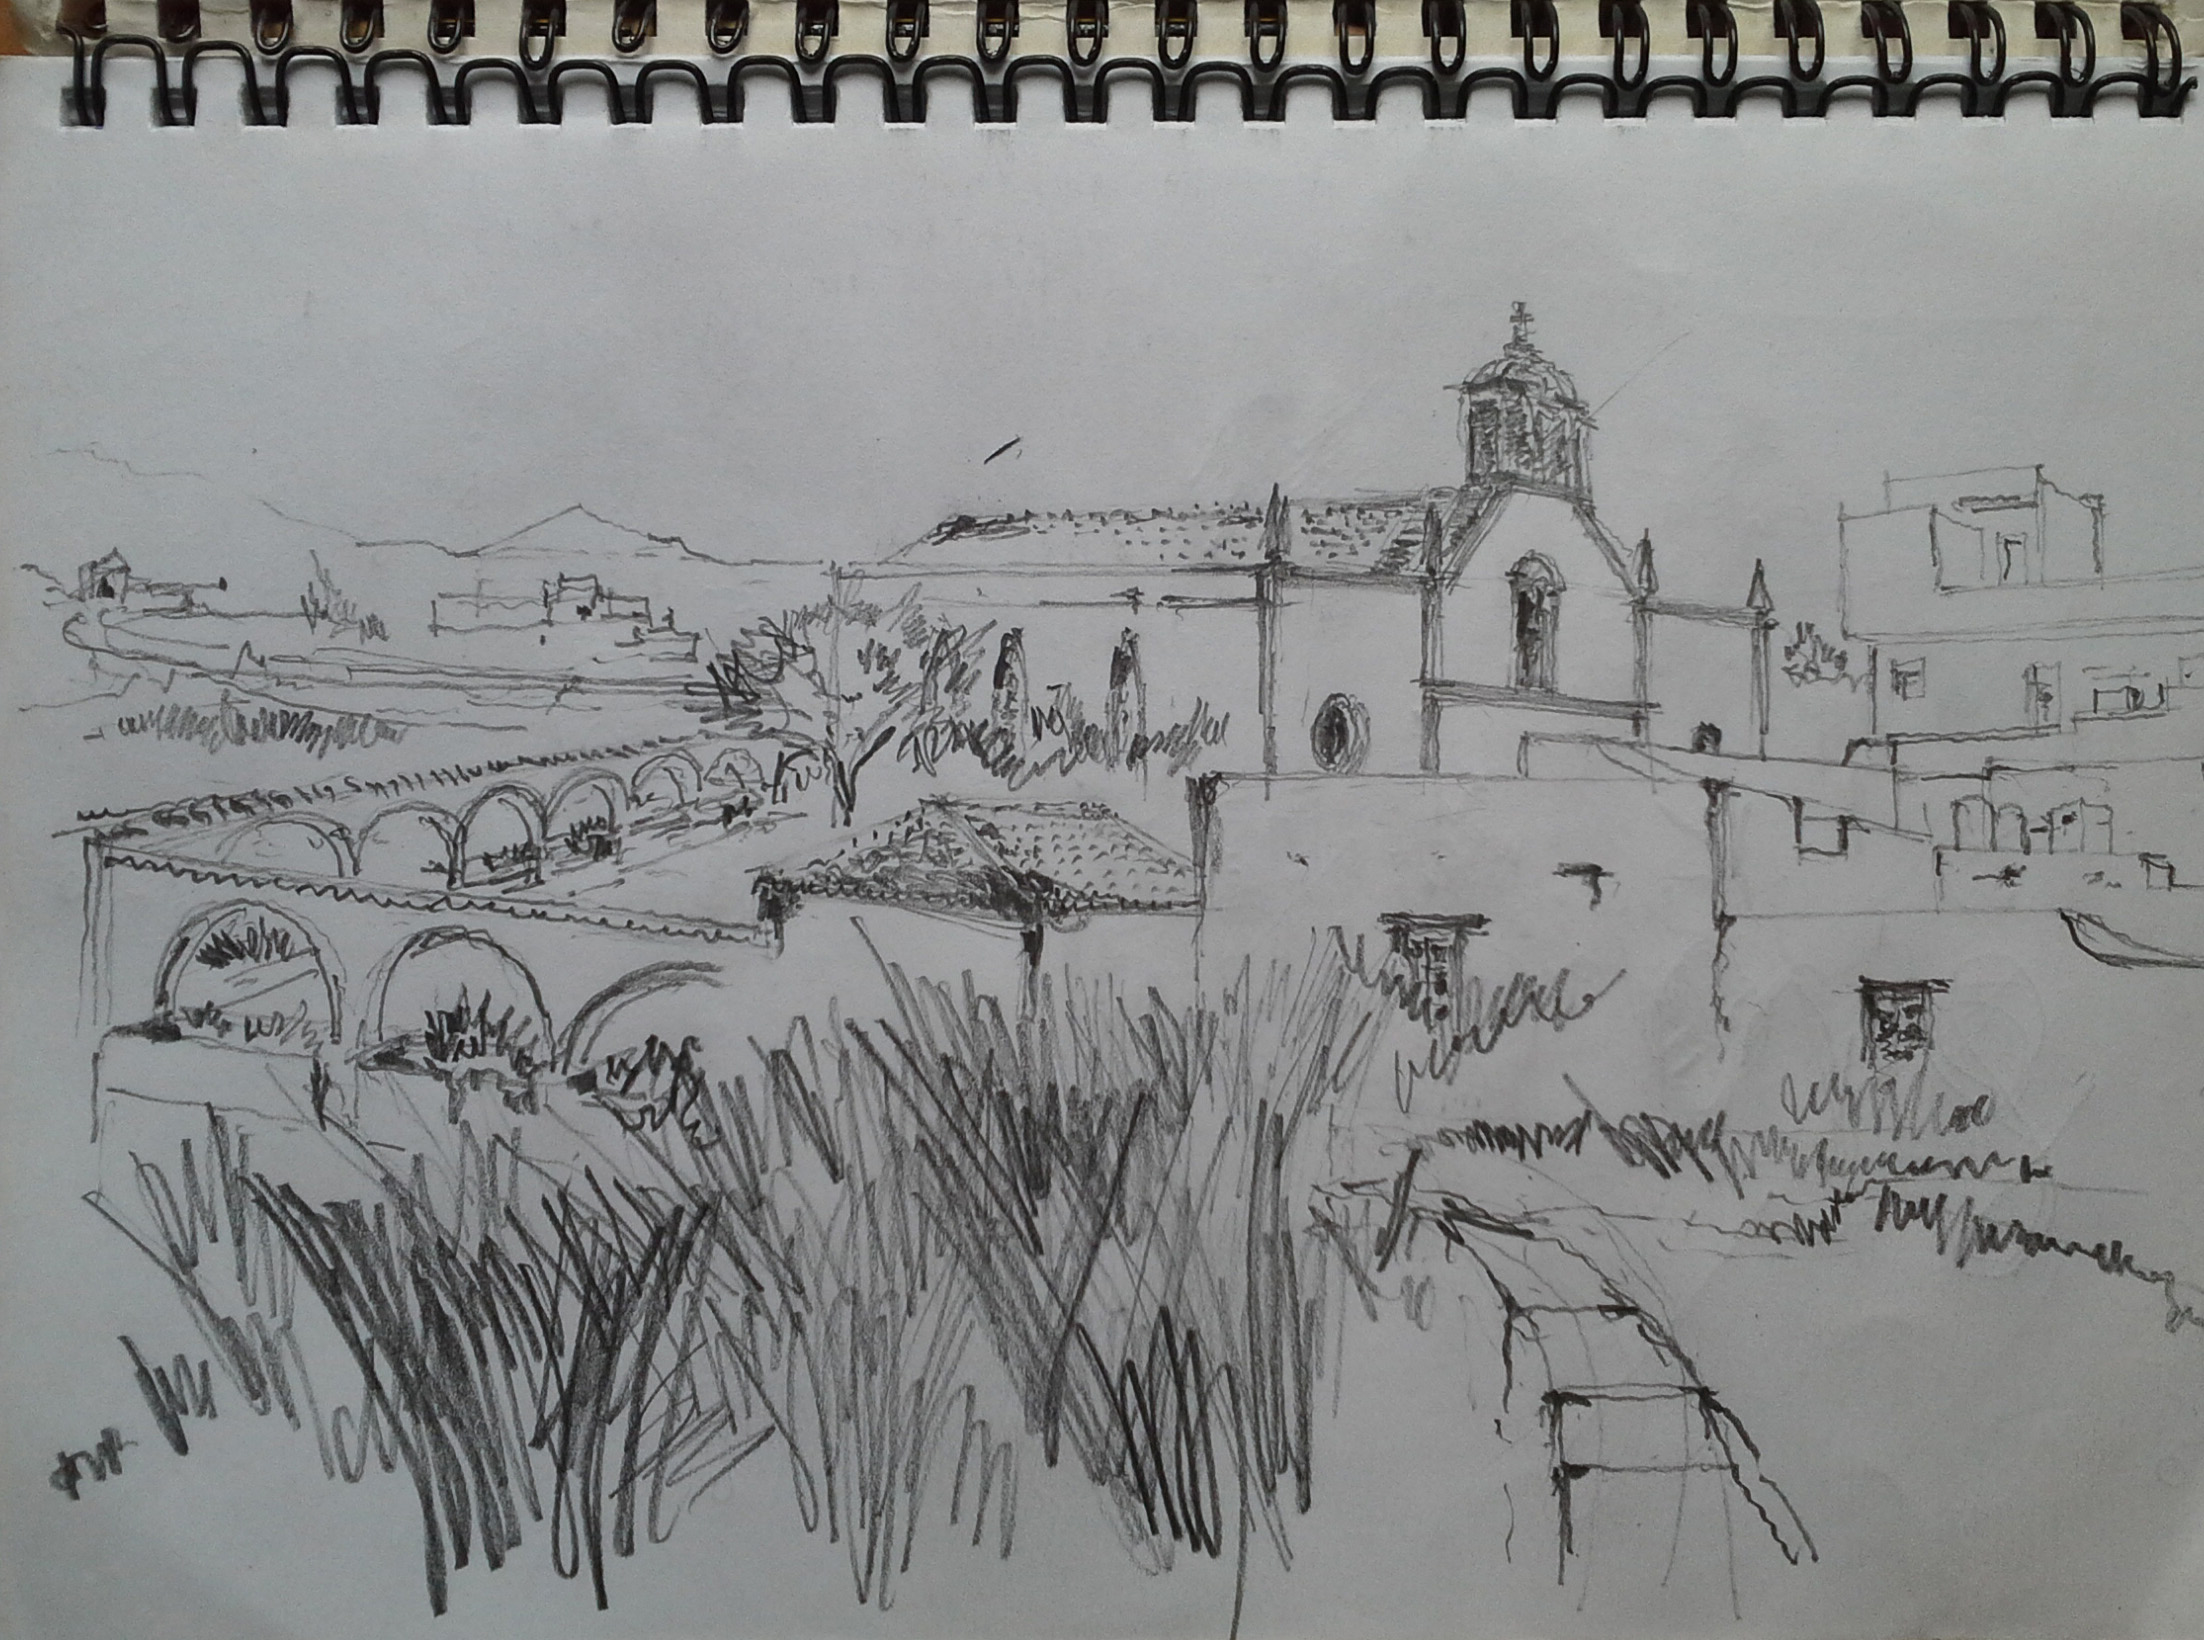 Rural Sketching